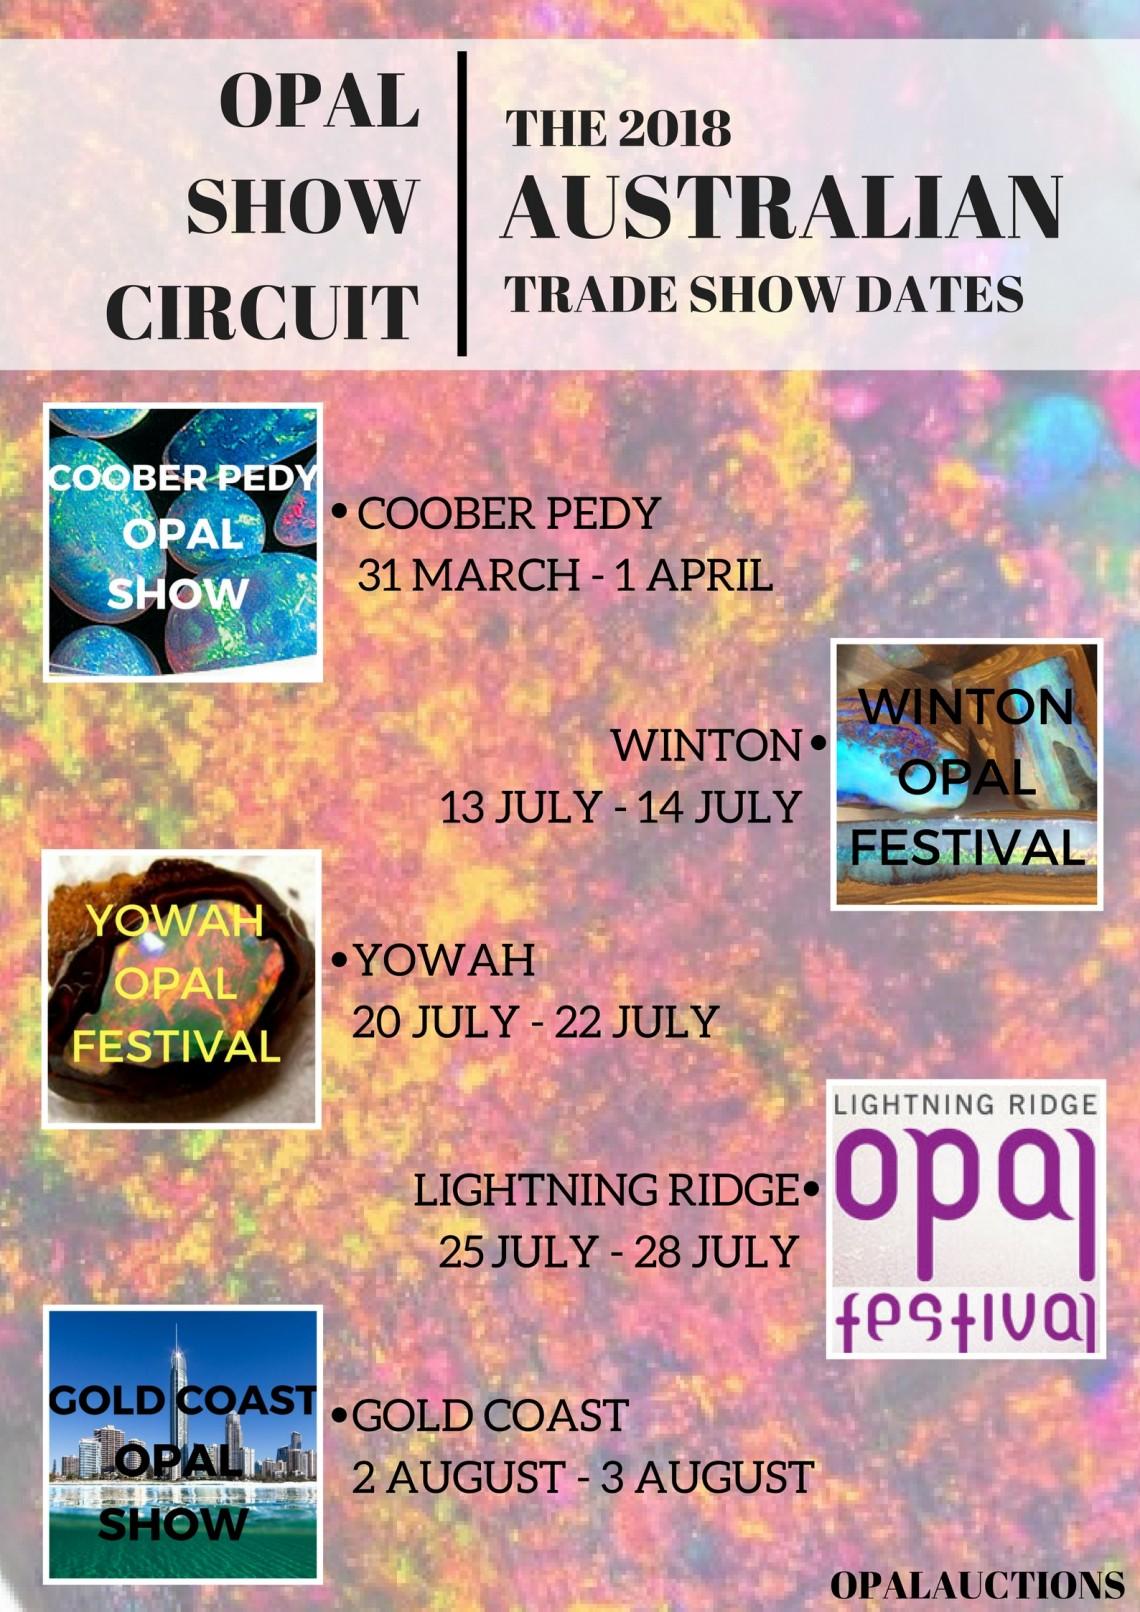 opal show circuit